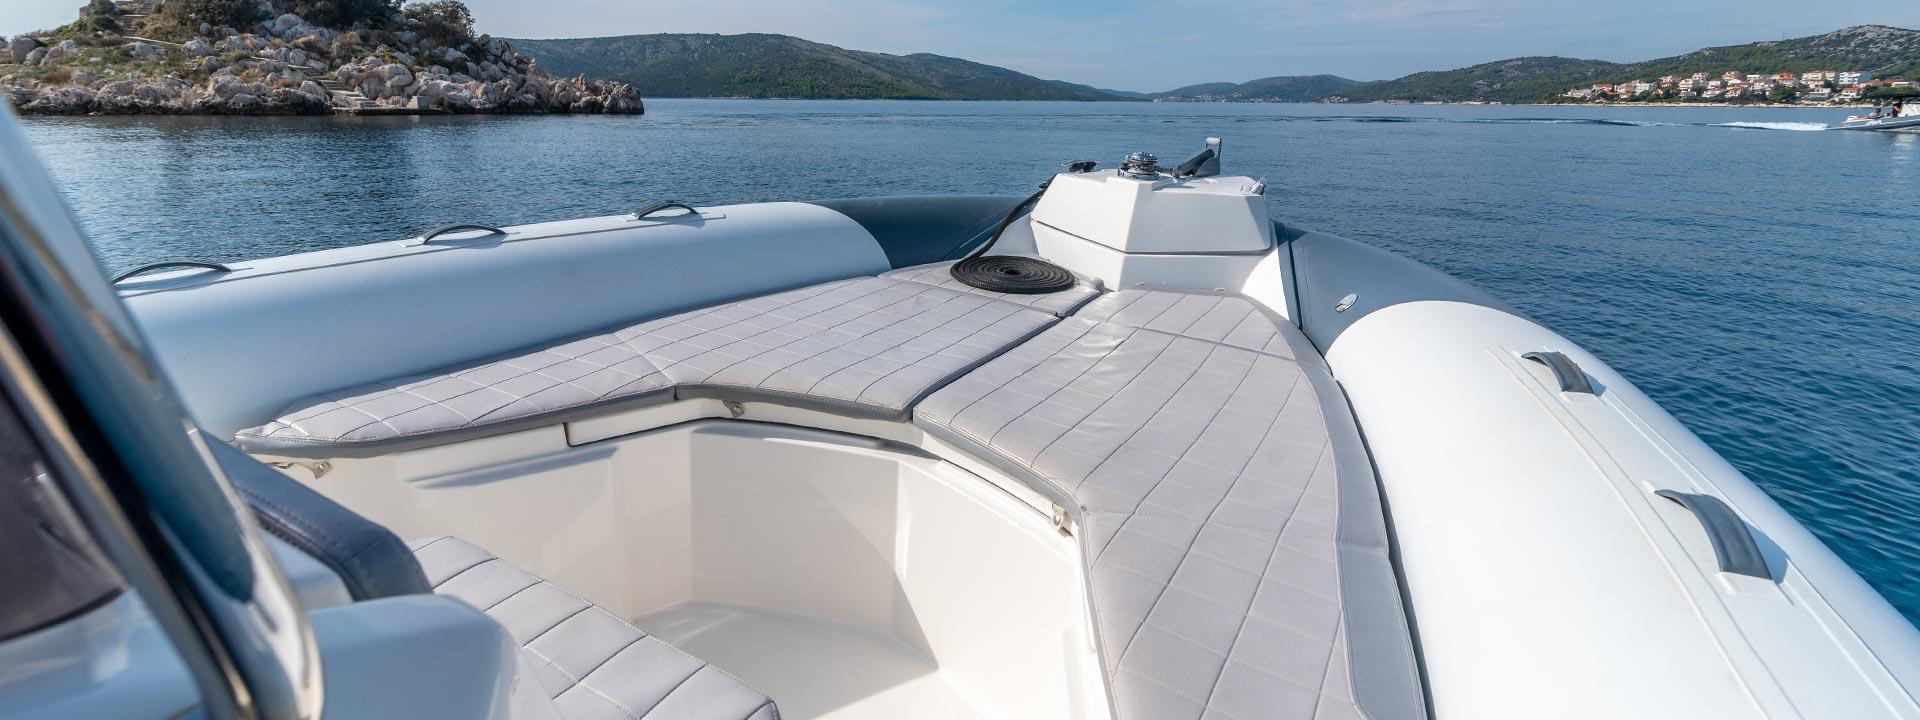 mayer-charter-boat-header-jeanneau-marlin-790-03